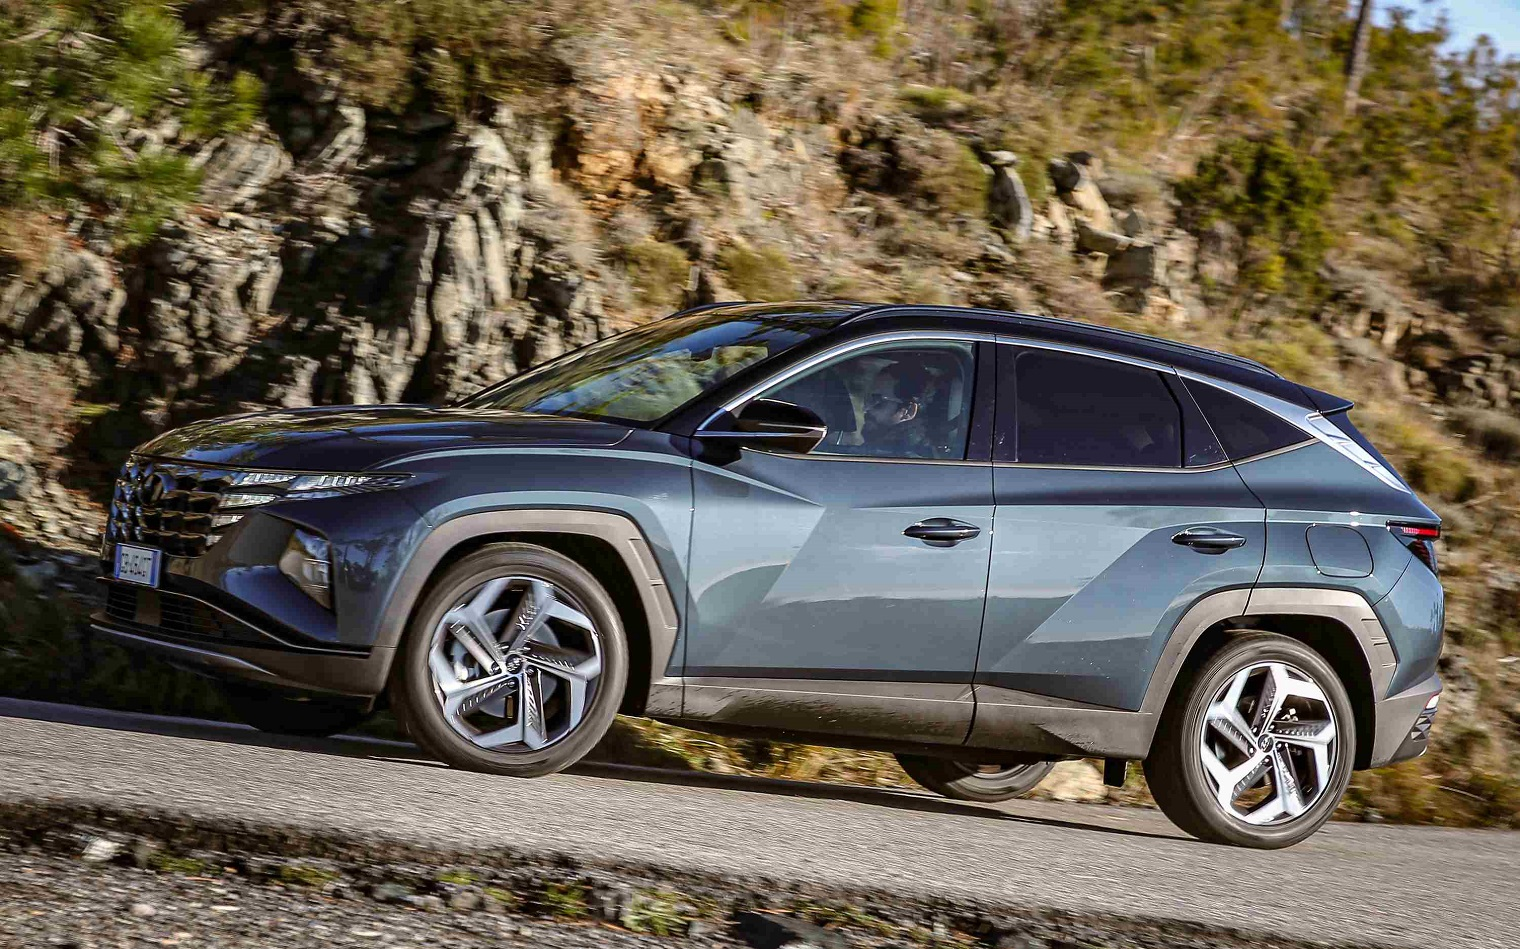 Nuova Hyundai Tucson dinamica